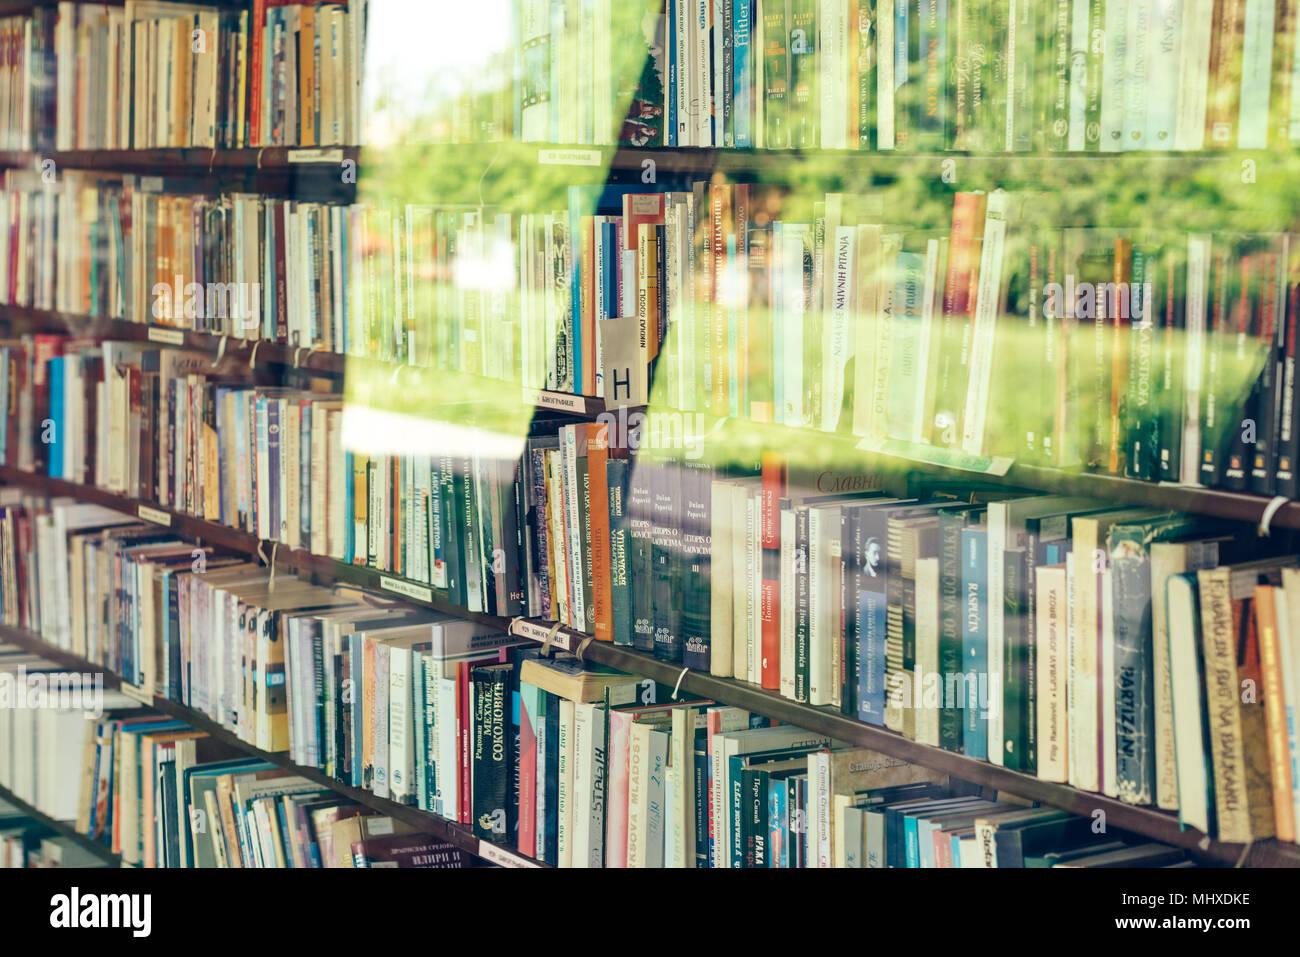 NOVI SAD, SERBIA - MAY 2, 2018: Various books on the shelf in small library at Bistrica in Novi Sad, illustrative editorial - Stock Image